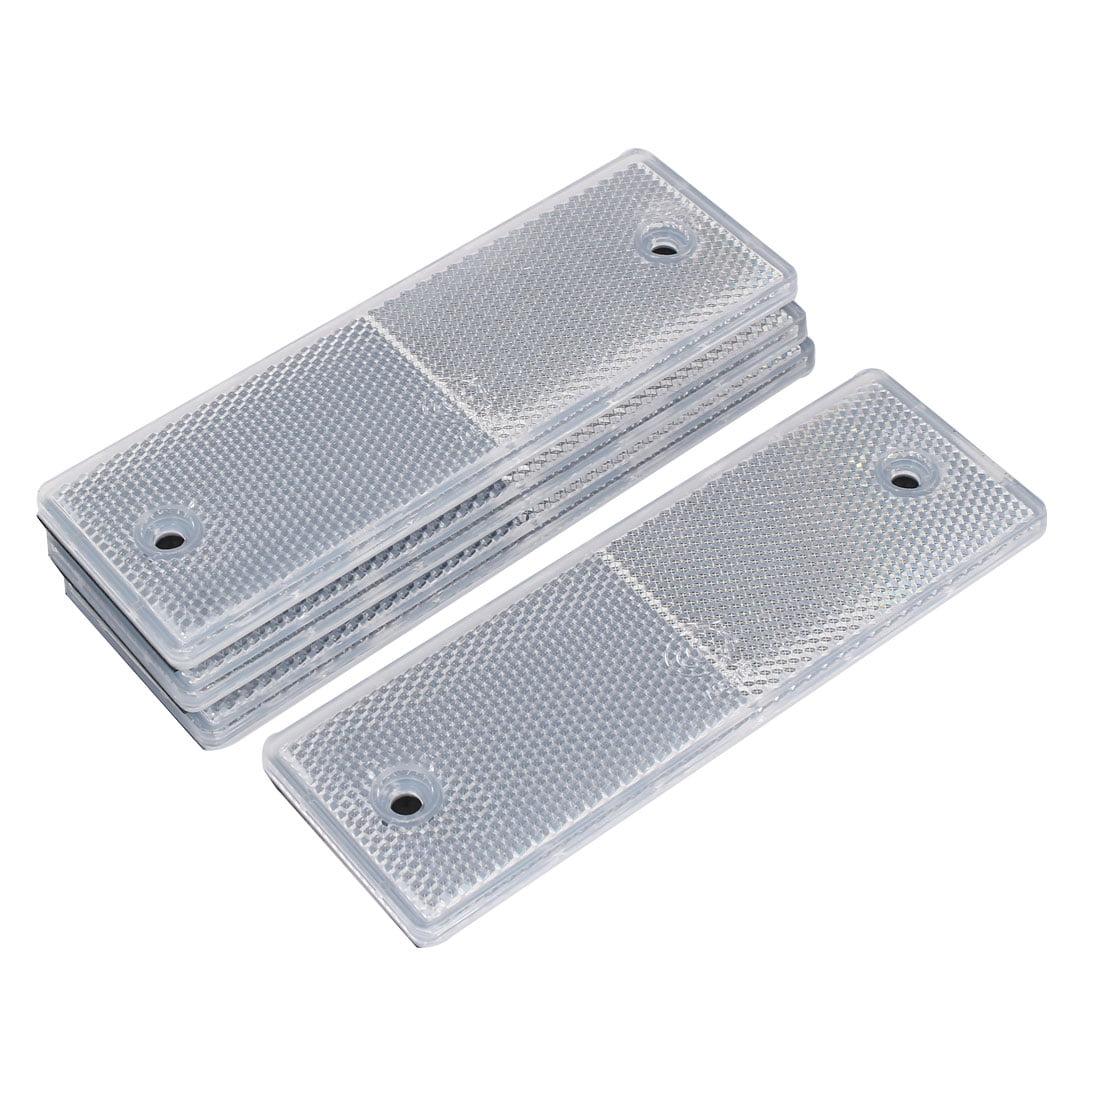 2 Holes Plastic Rectangle Reflective Warning Plate Reflectors White 4 Pcs